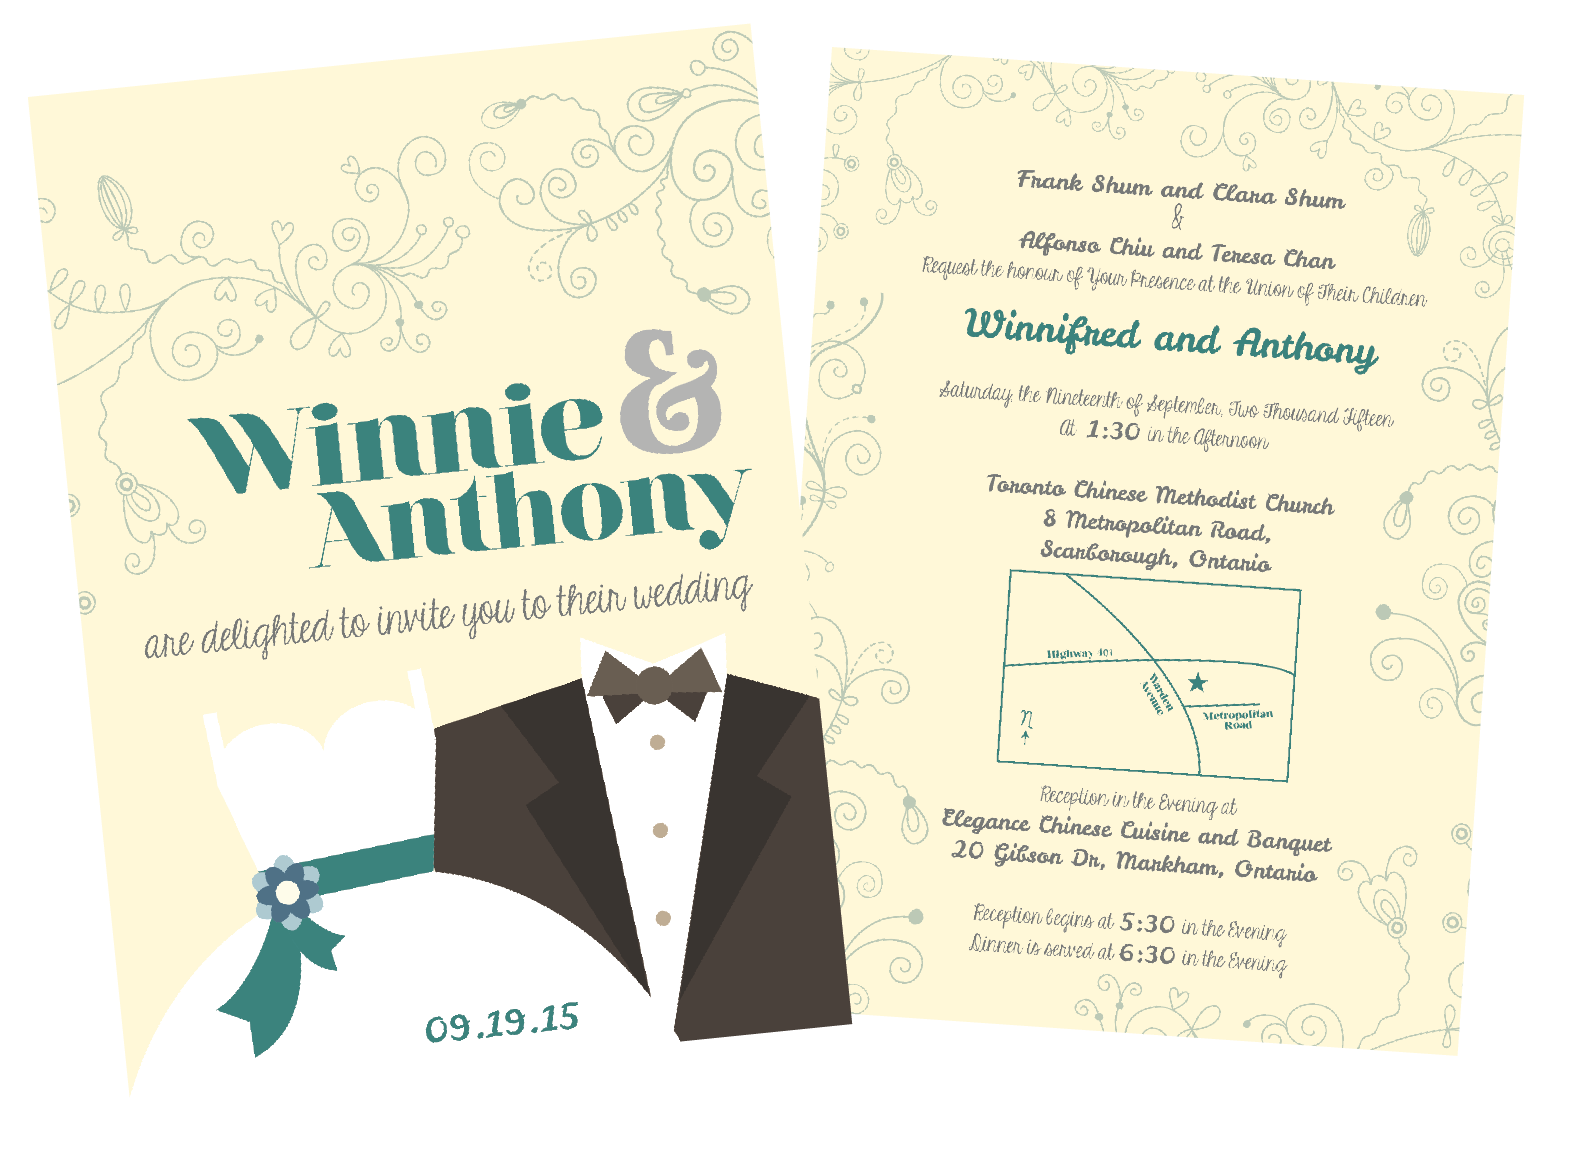 Wedding card layout design adrian cheung wedding card layout design stopboris Choice Image